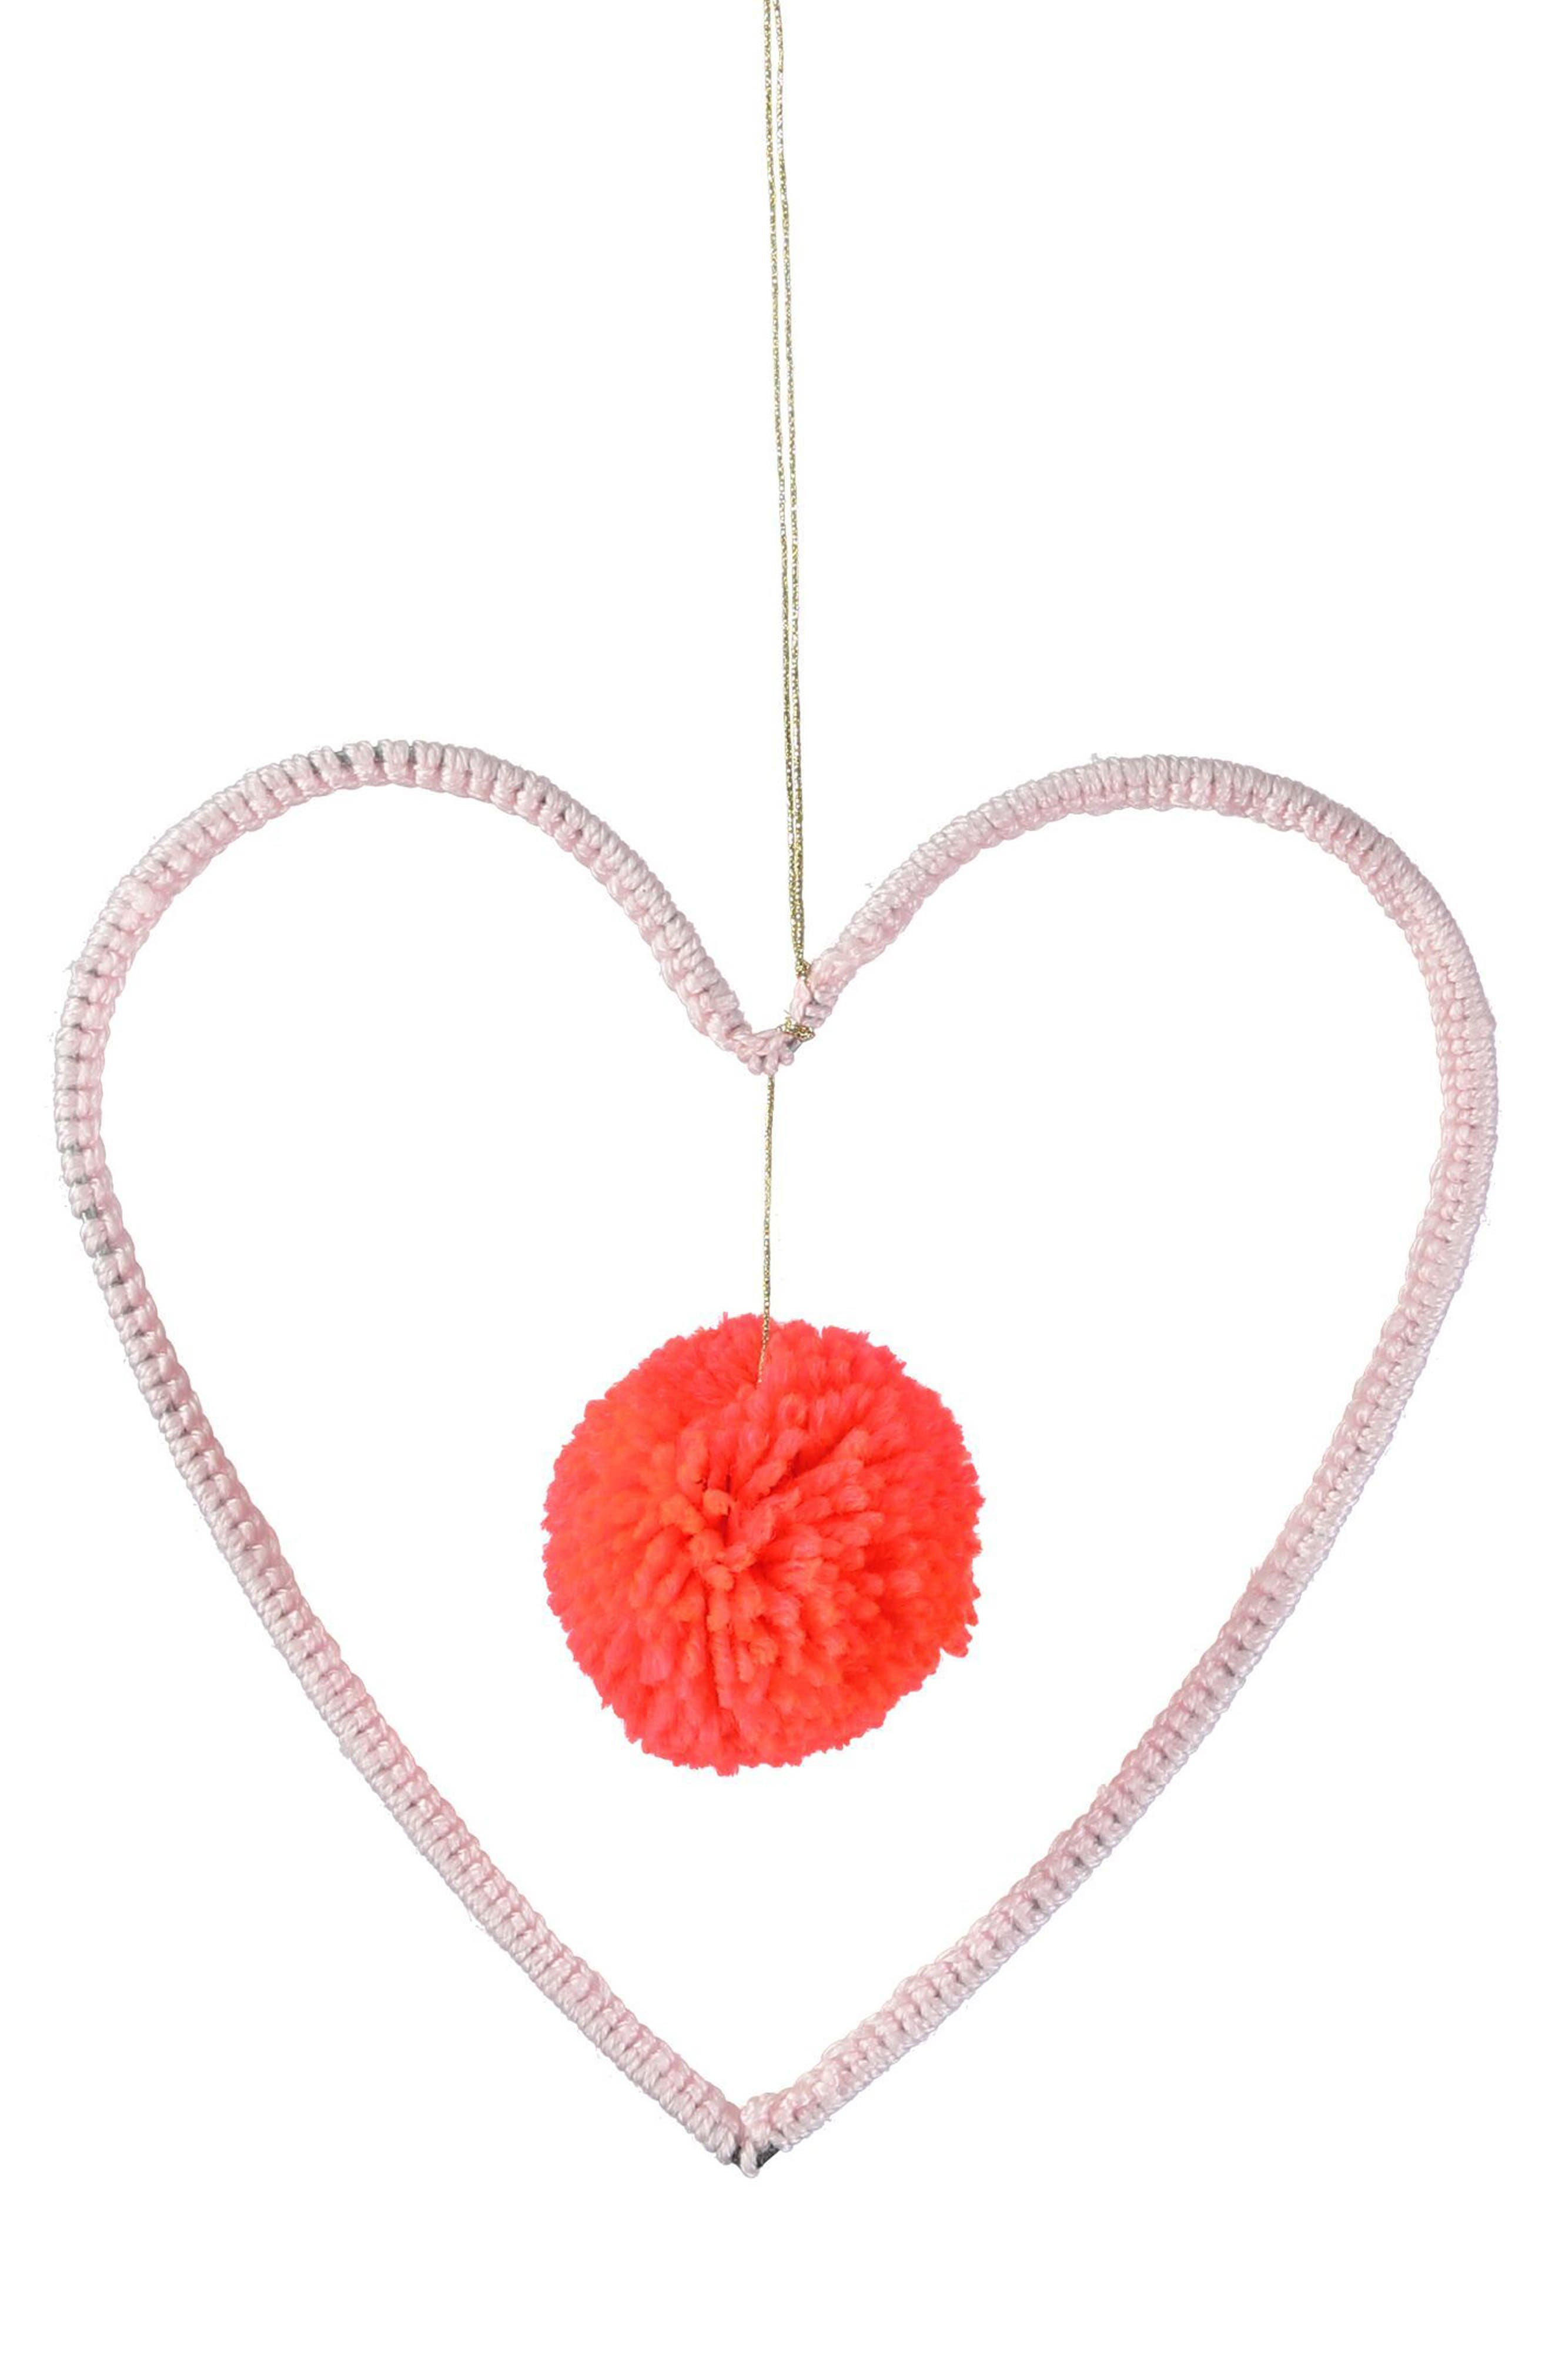 Main Image - Meri Meri Hanging Heart & Pom Wall Art